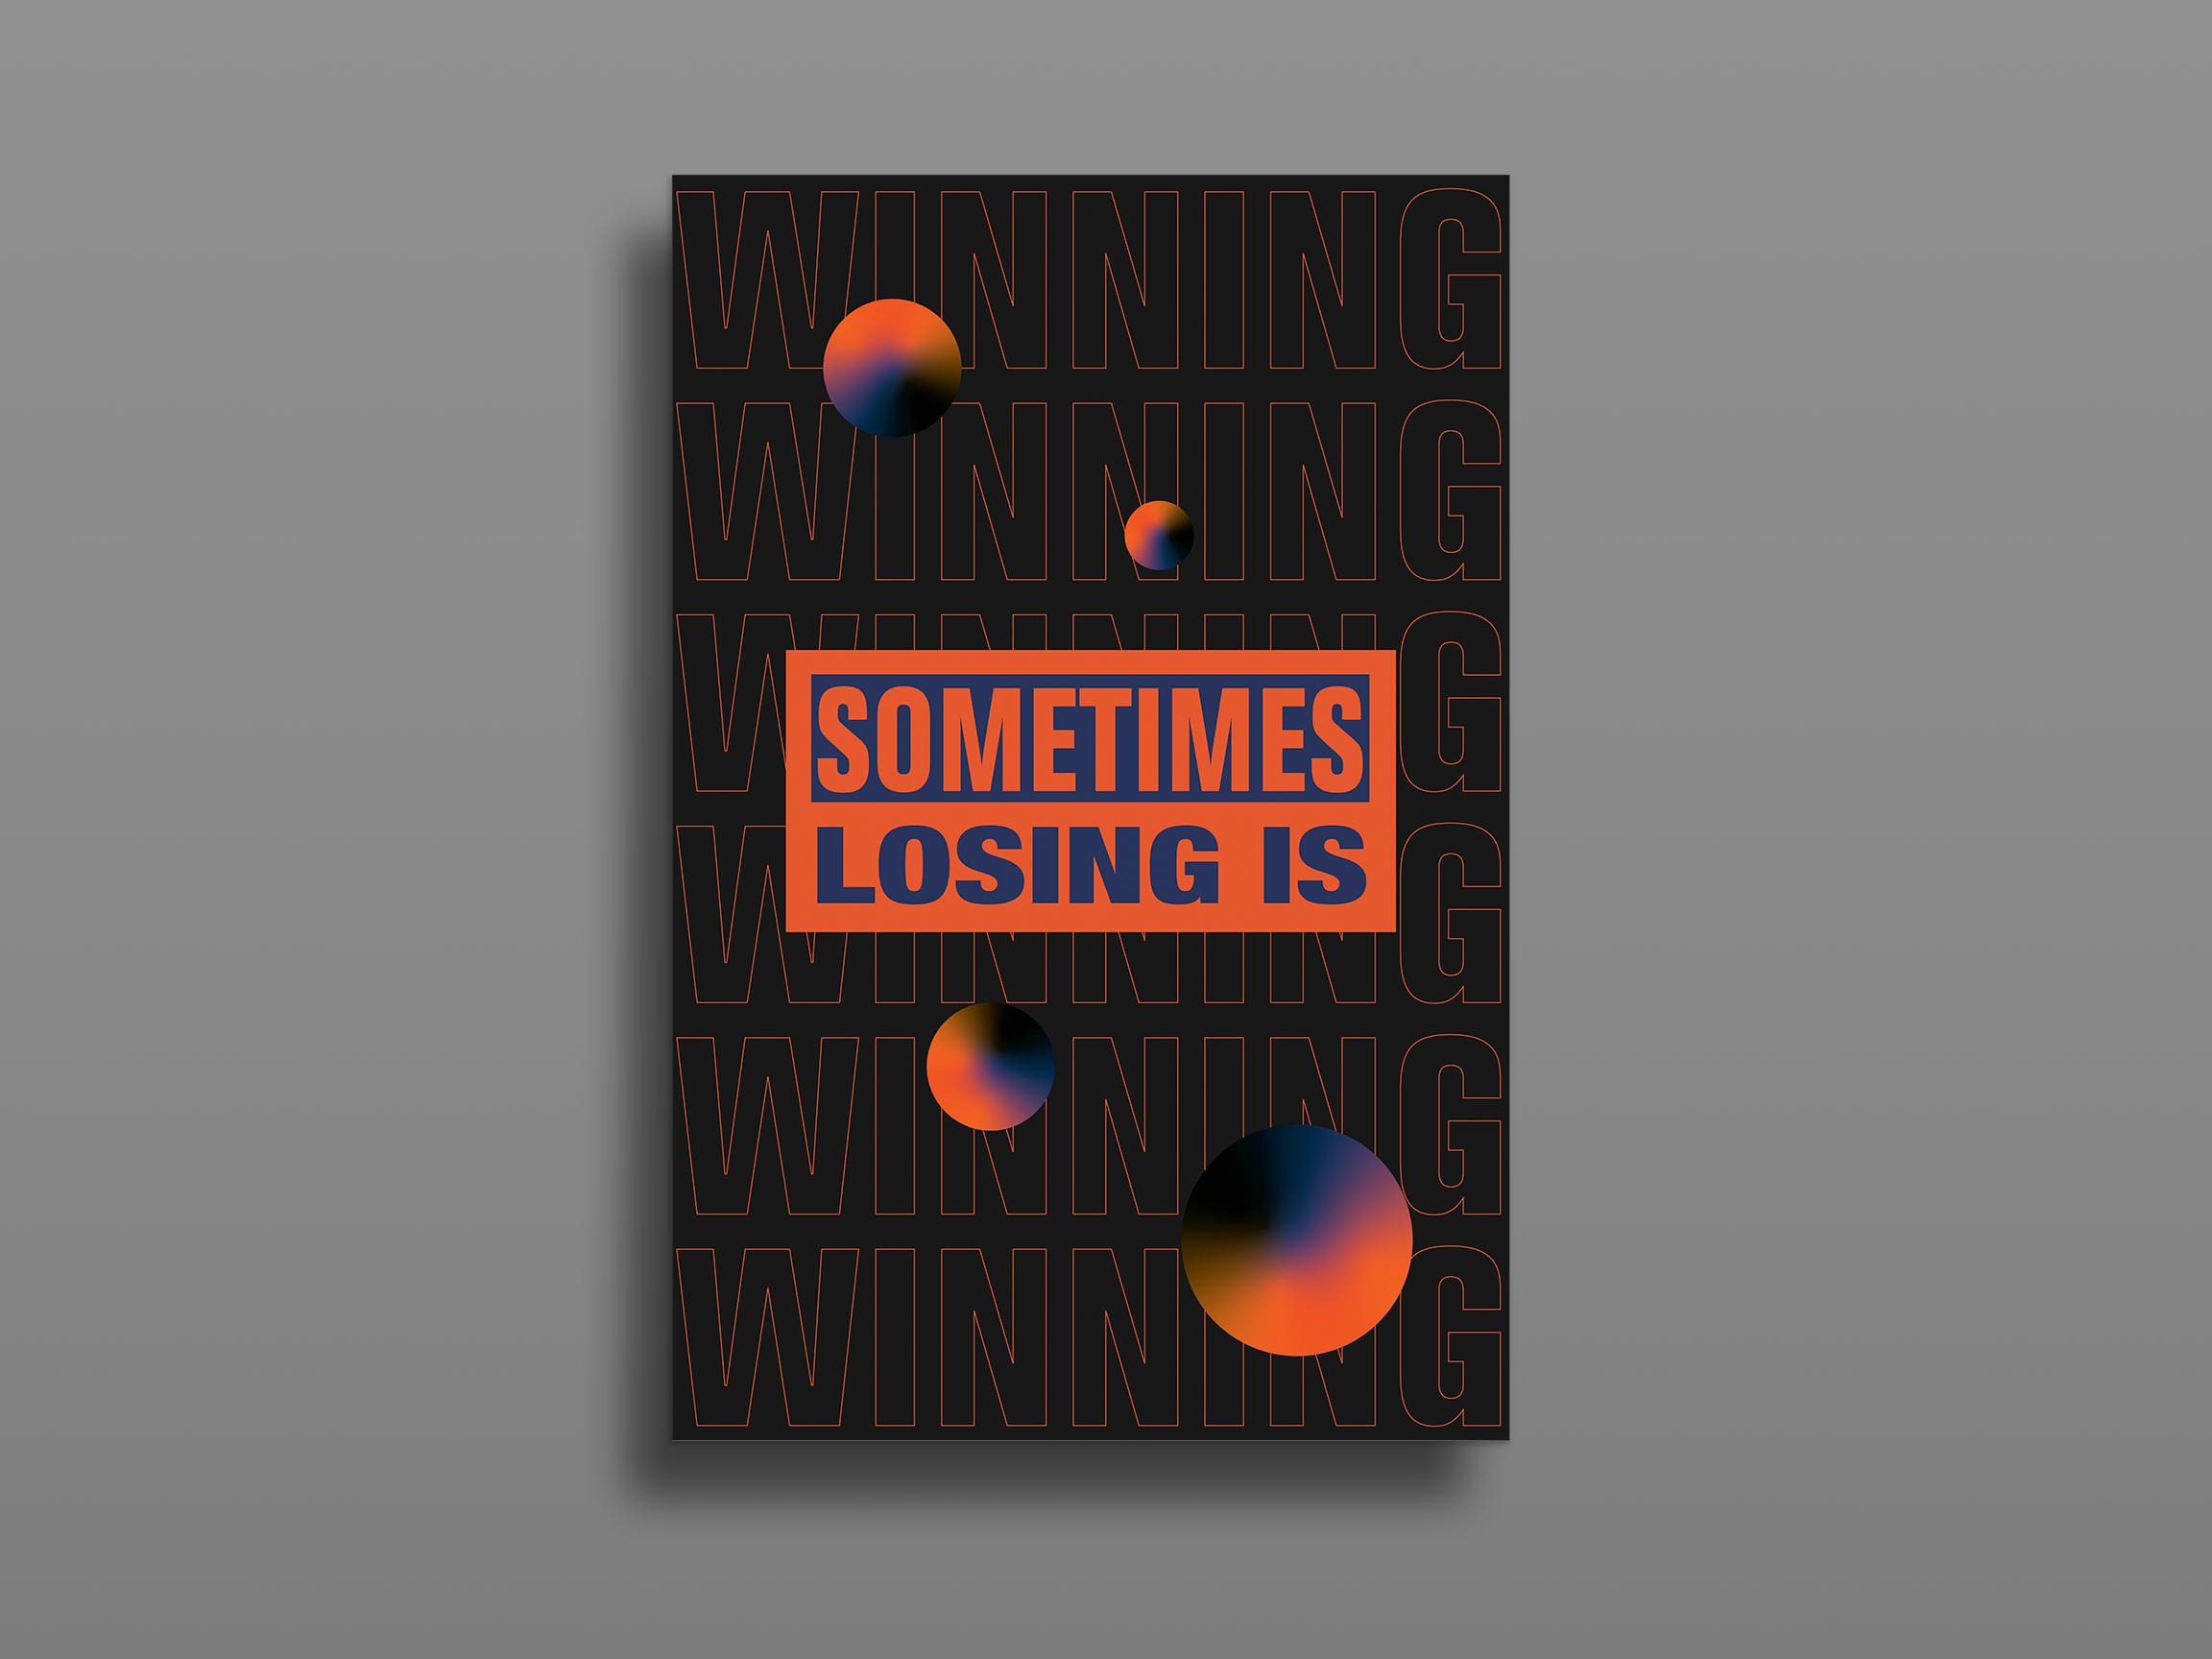 Sometimes losing is winning 2